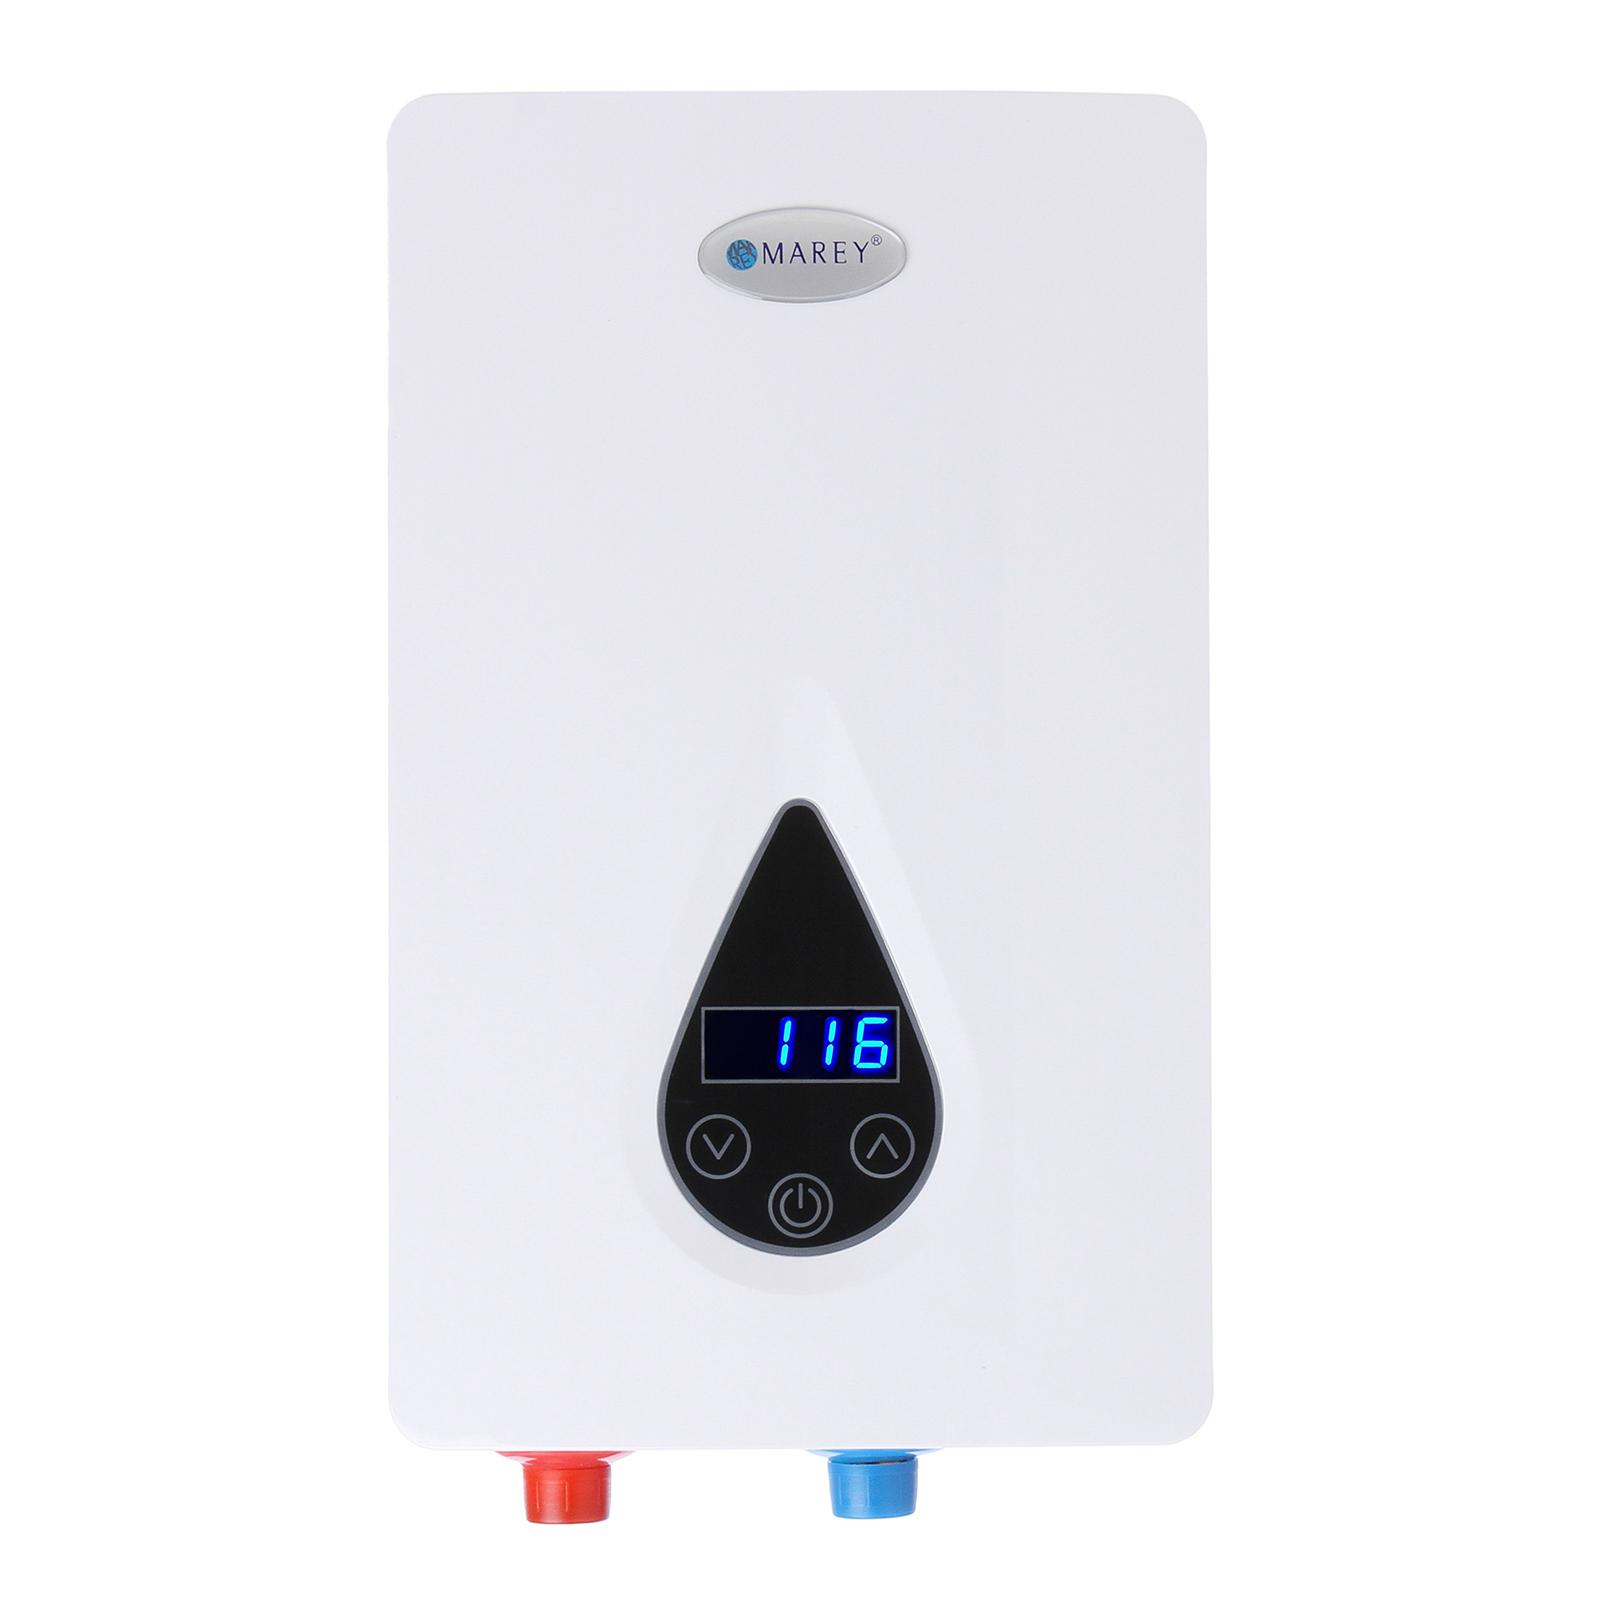 Marey 240V Electric Digital On Demand Tankless Water Heater MAREYECO110